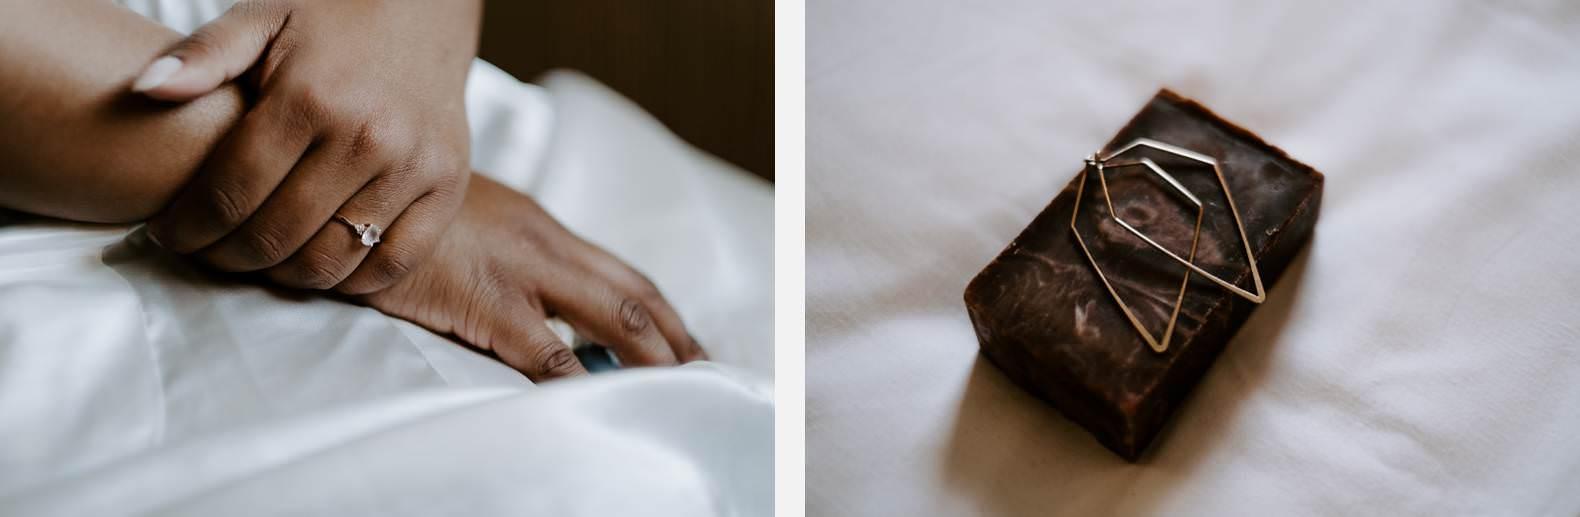 mariage manoir de corny photographe bel esprit 0001 1